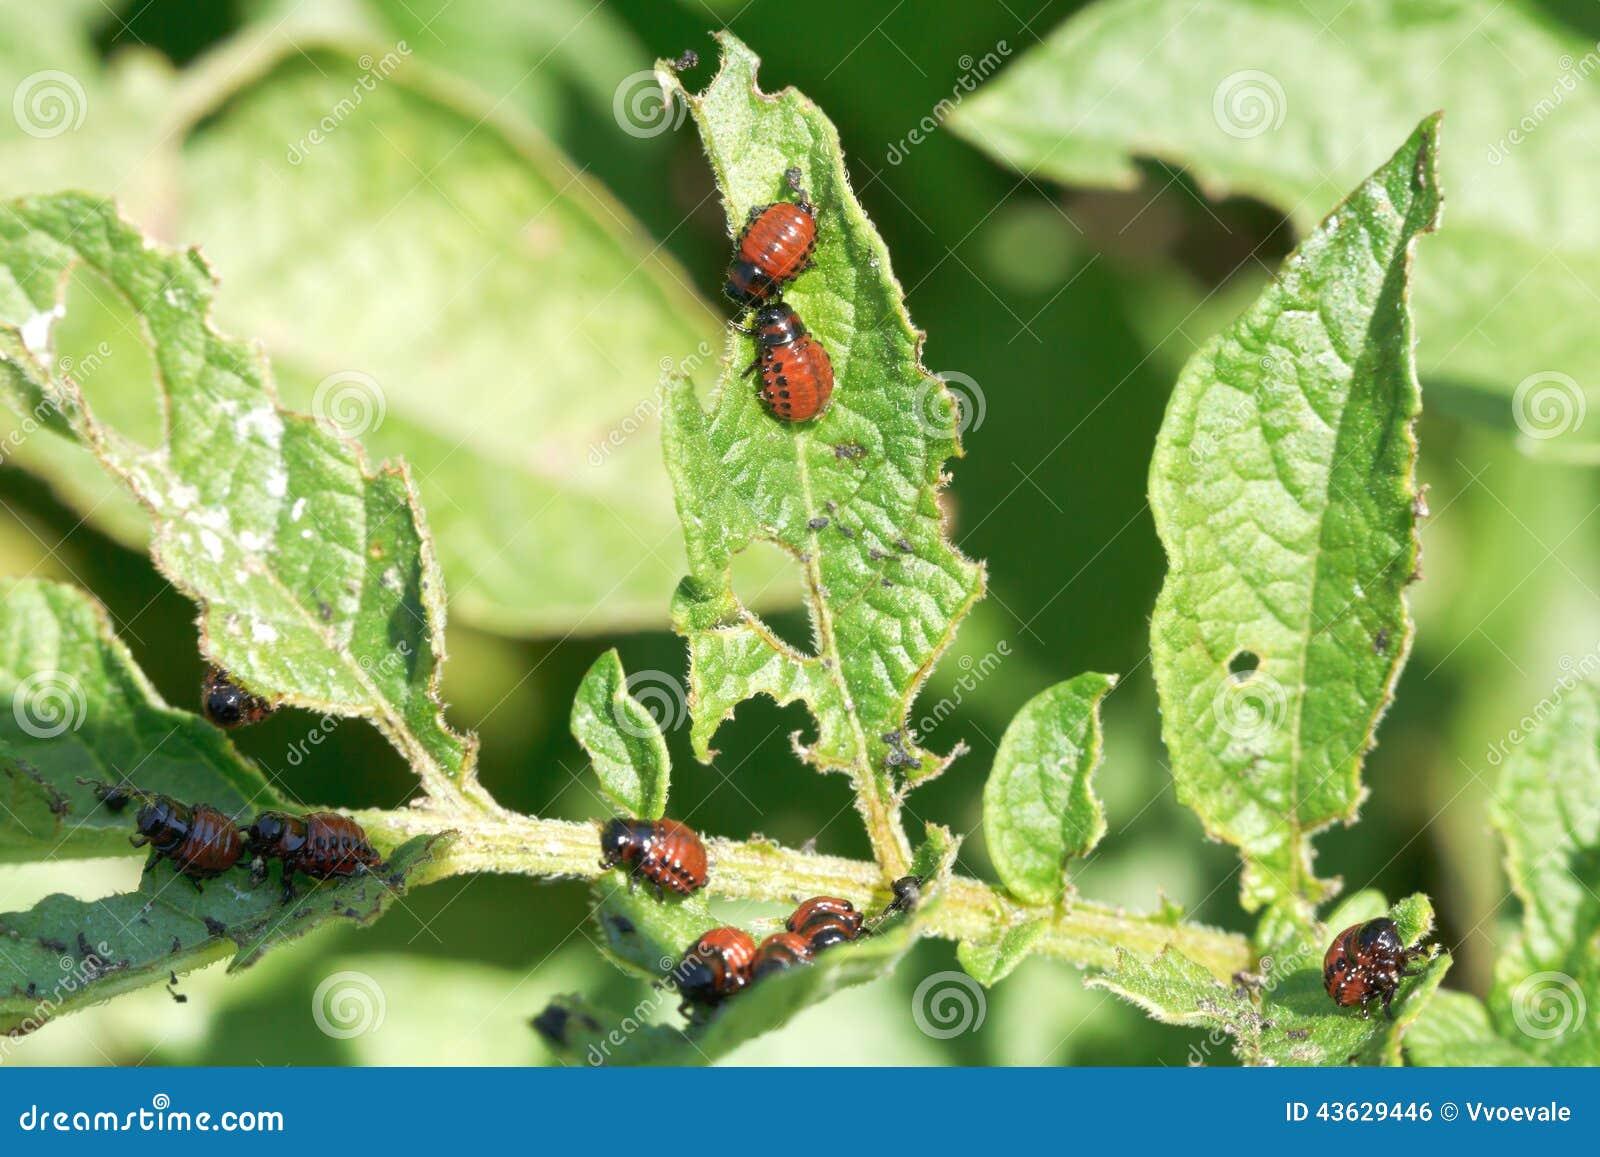 Potato bug larva in potatoes leaves